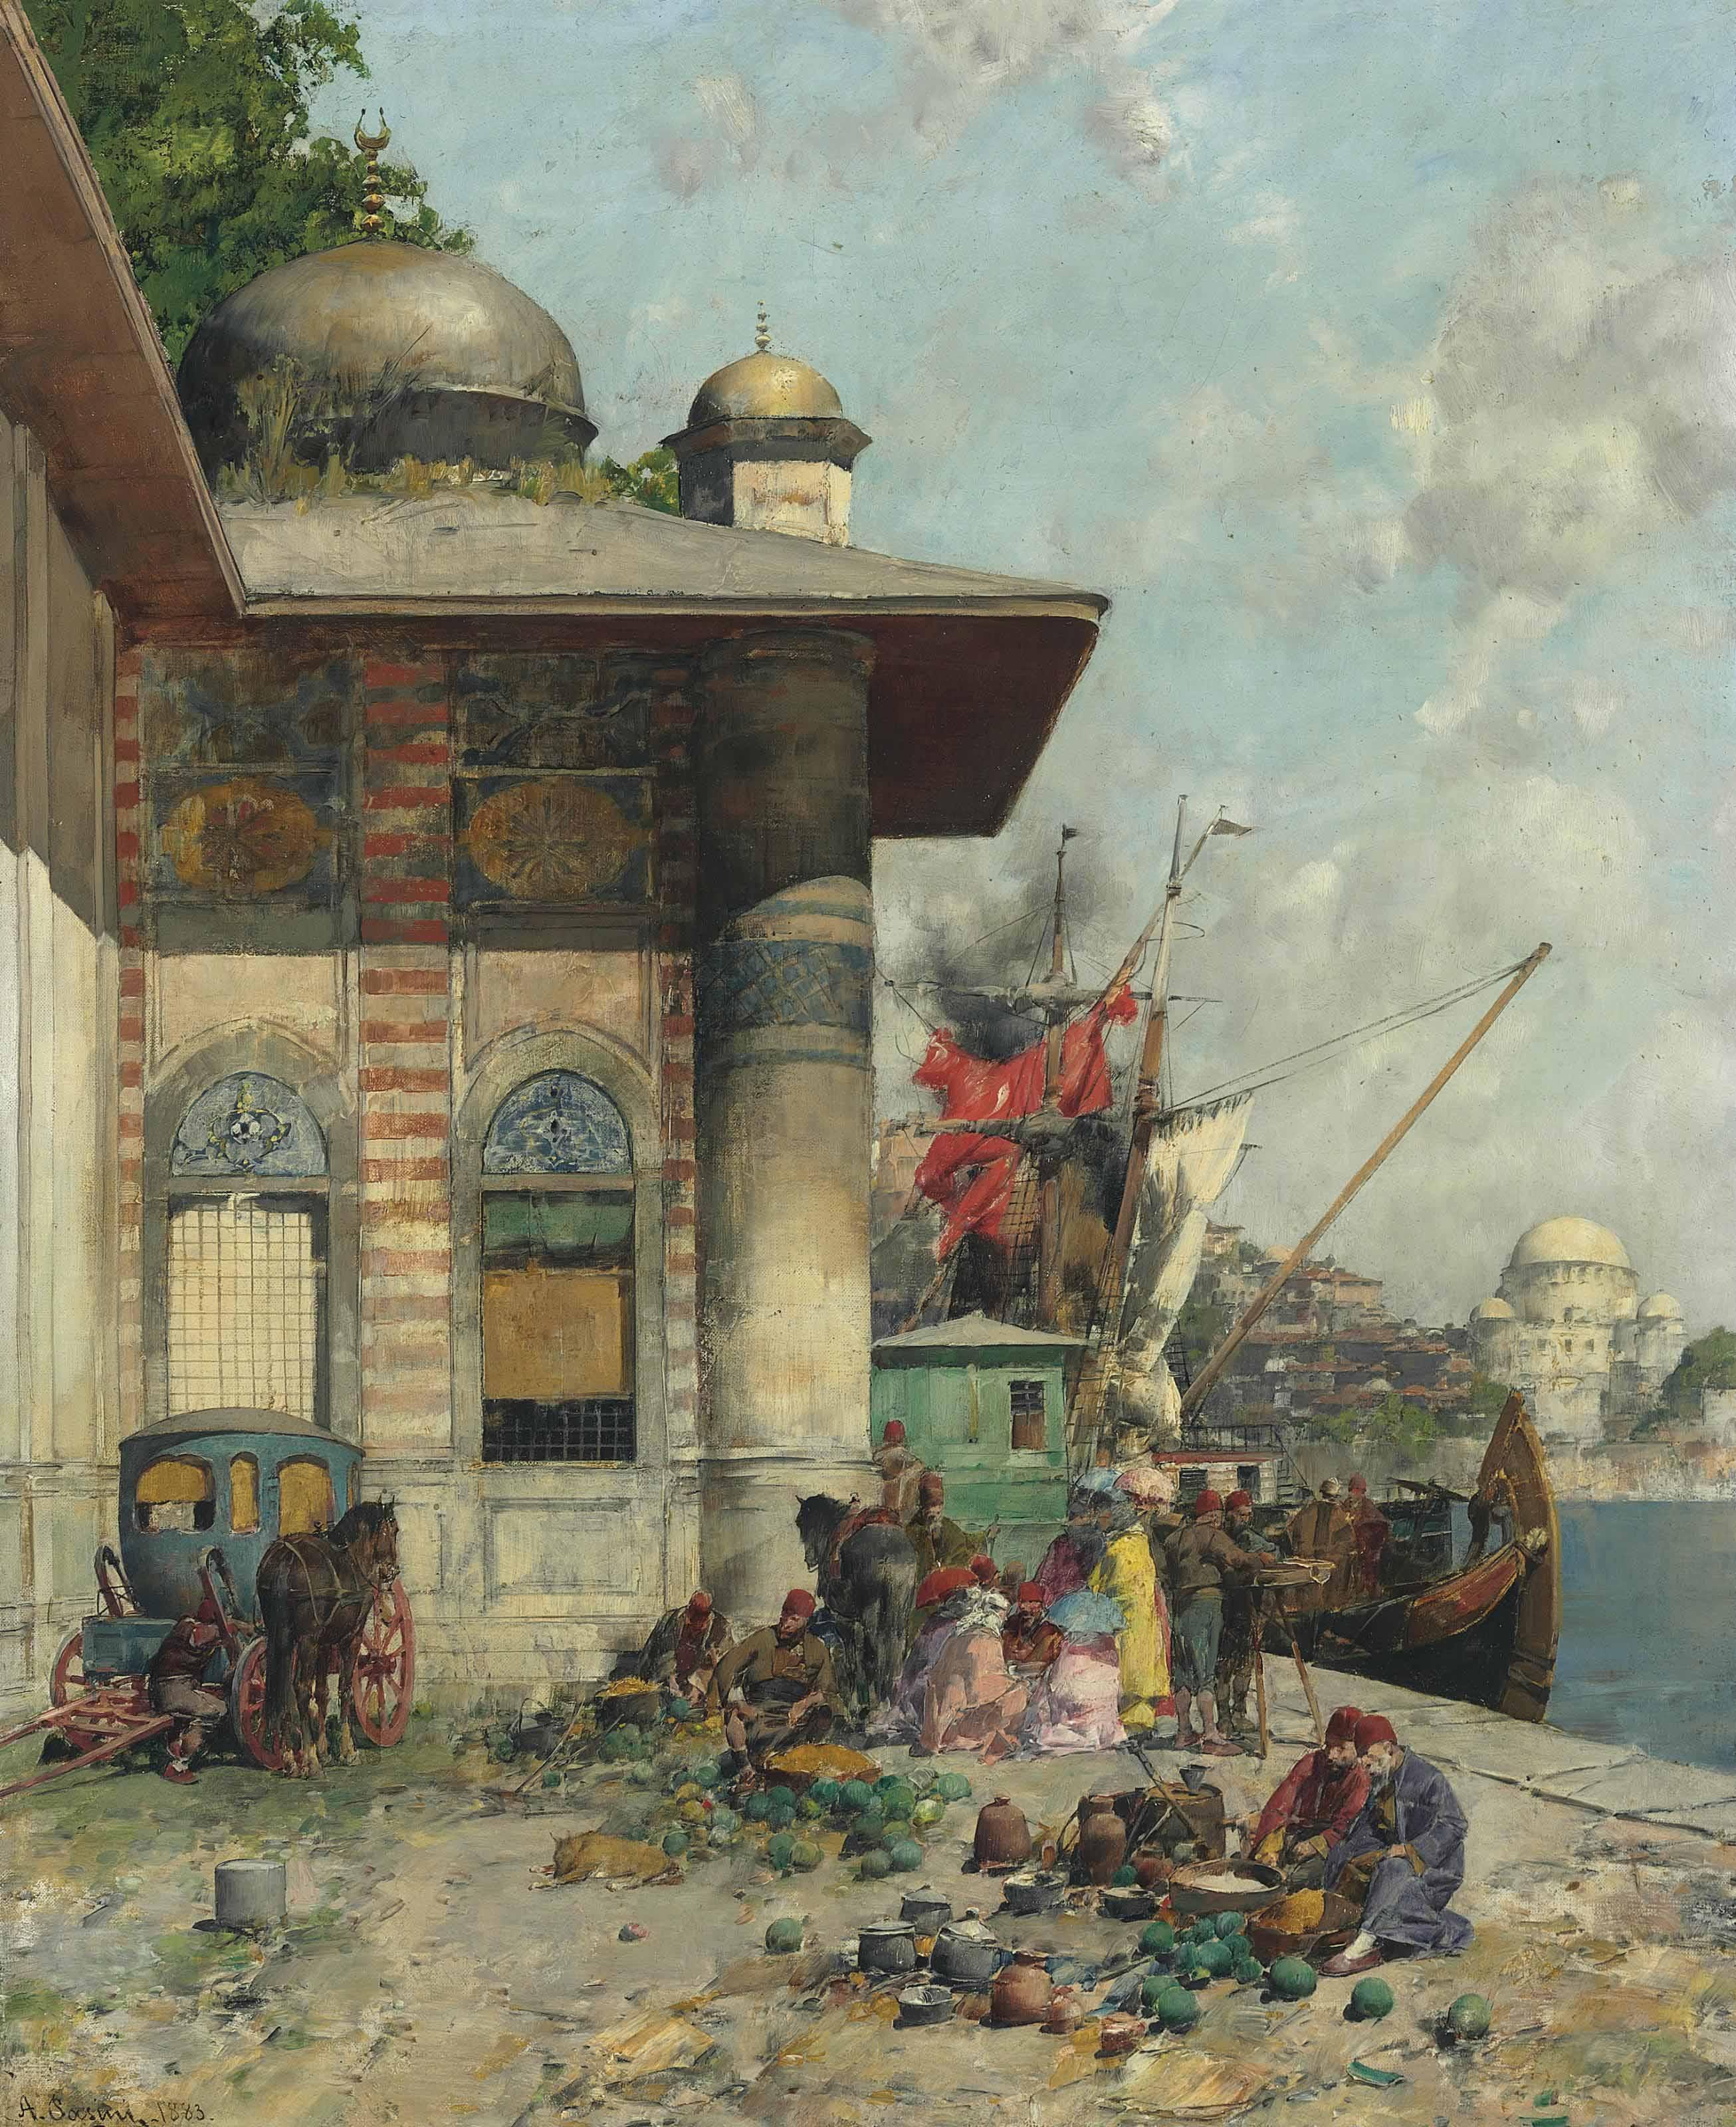 Market day, a capriccio of the Old City Shores, Constantinople